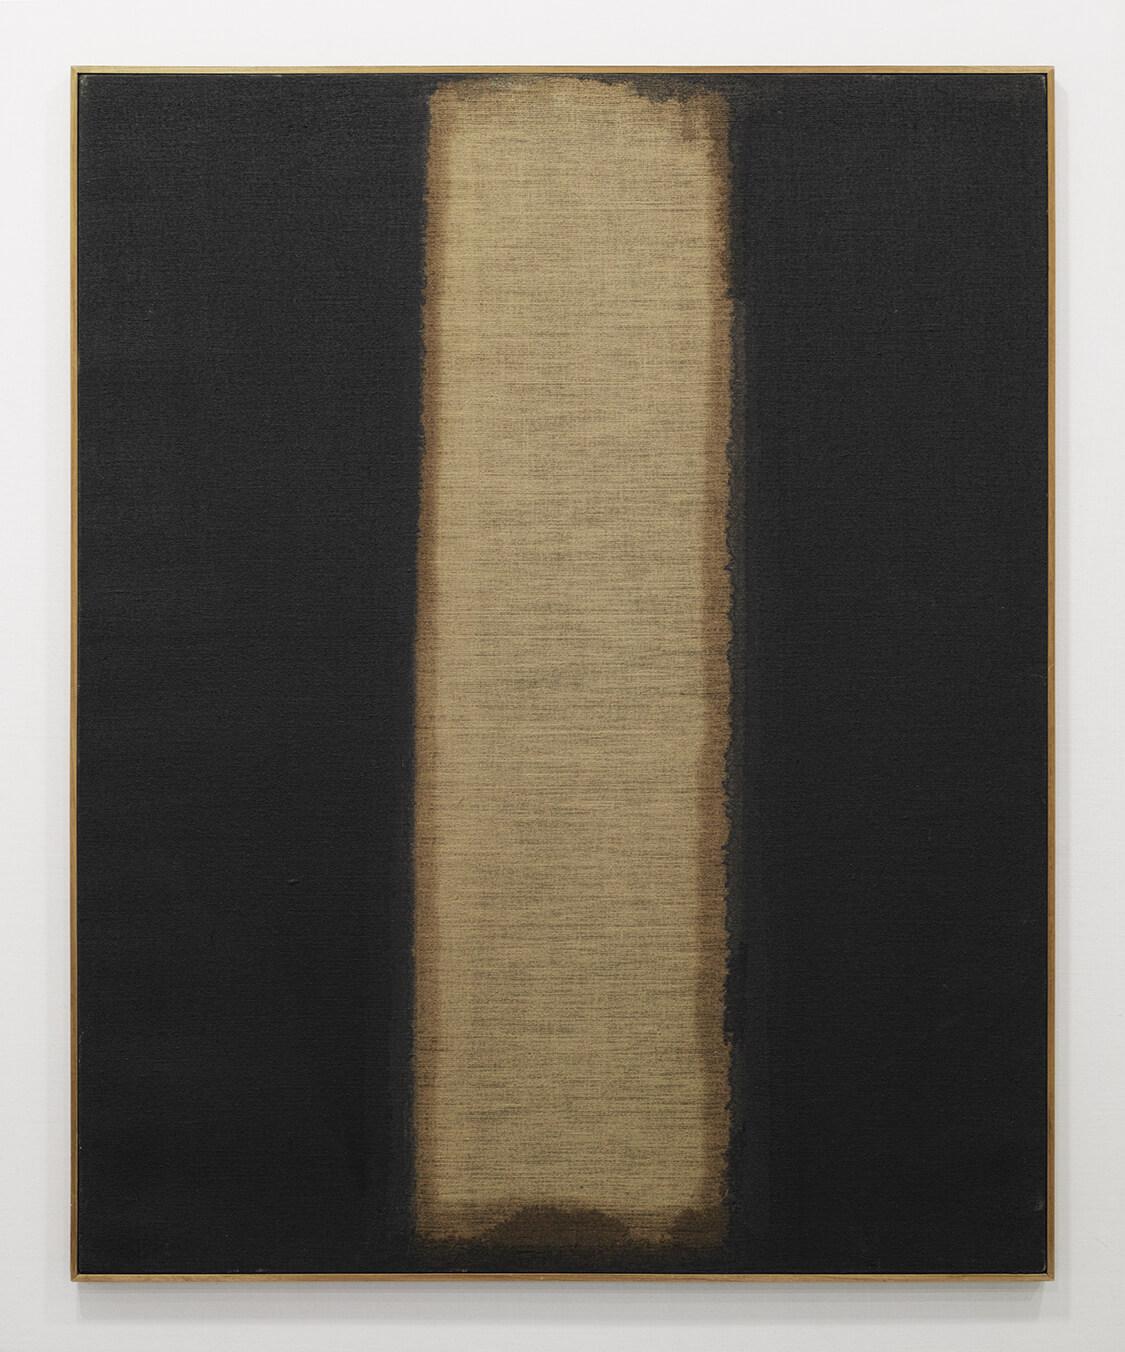 <b>UMBER-BLUE 1977</b><br>Oil on Canvas<br>100.0 x 80.3 cm<br>Coll: Tokyo Opera City Art Gallery